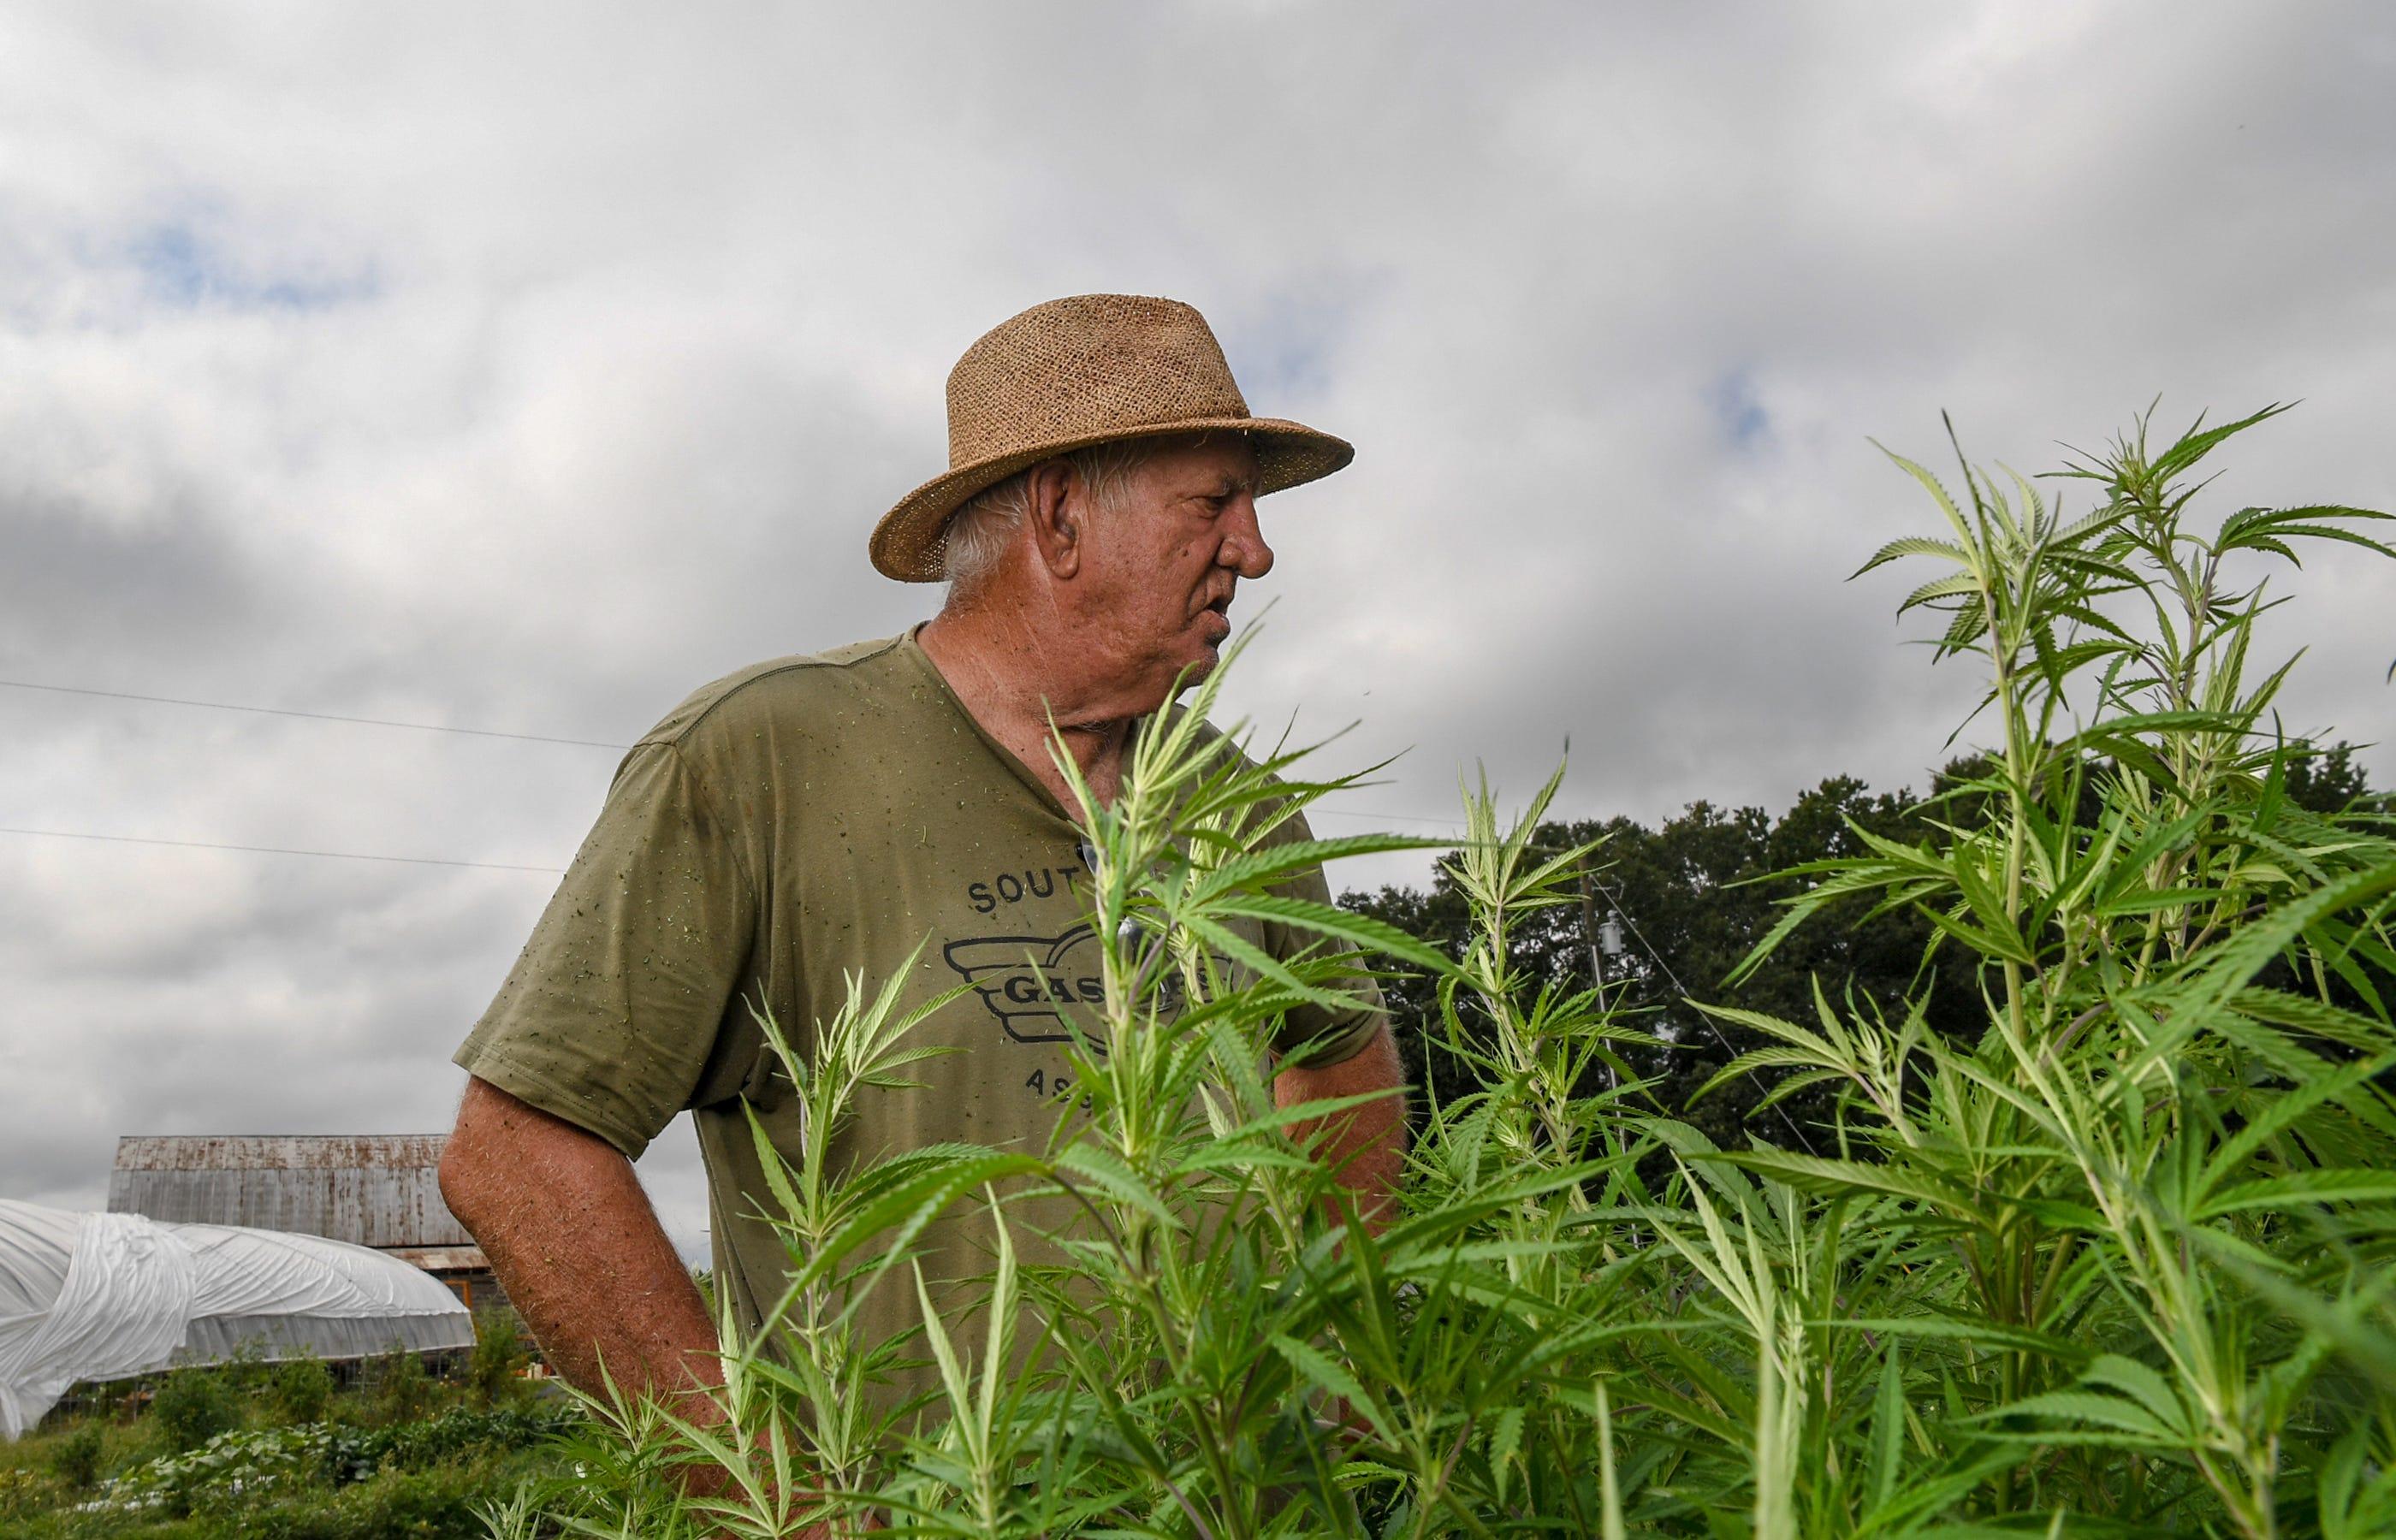 South Carolina farmers go all in for hemp despite industry's risks